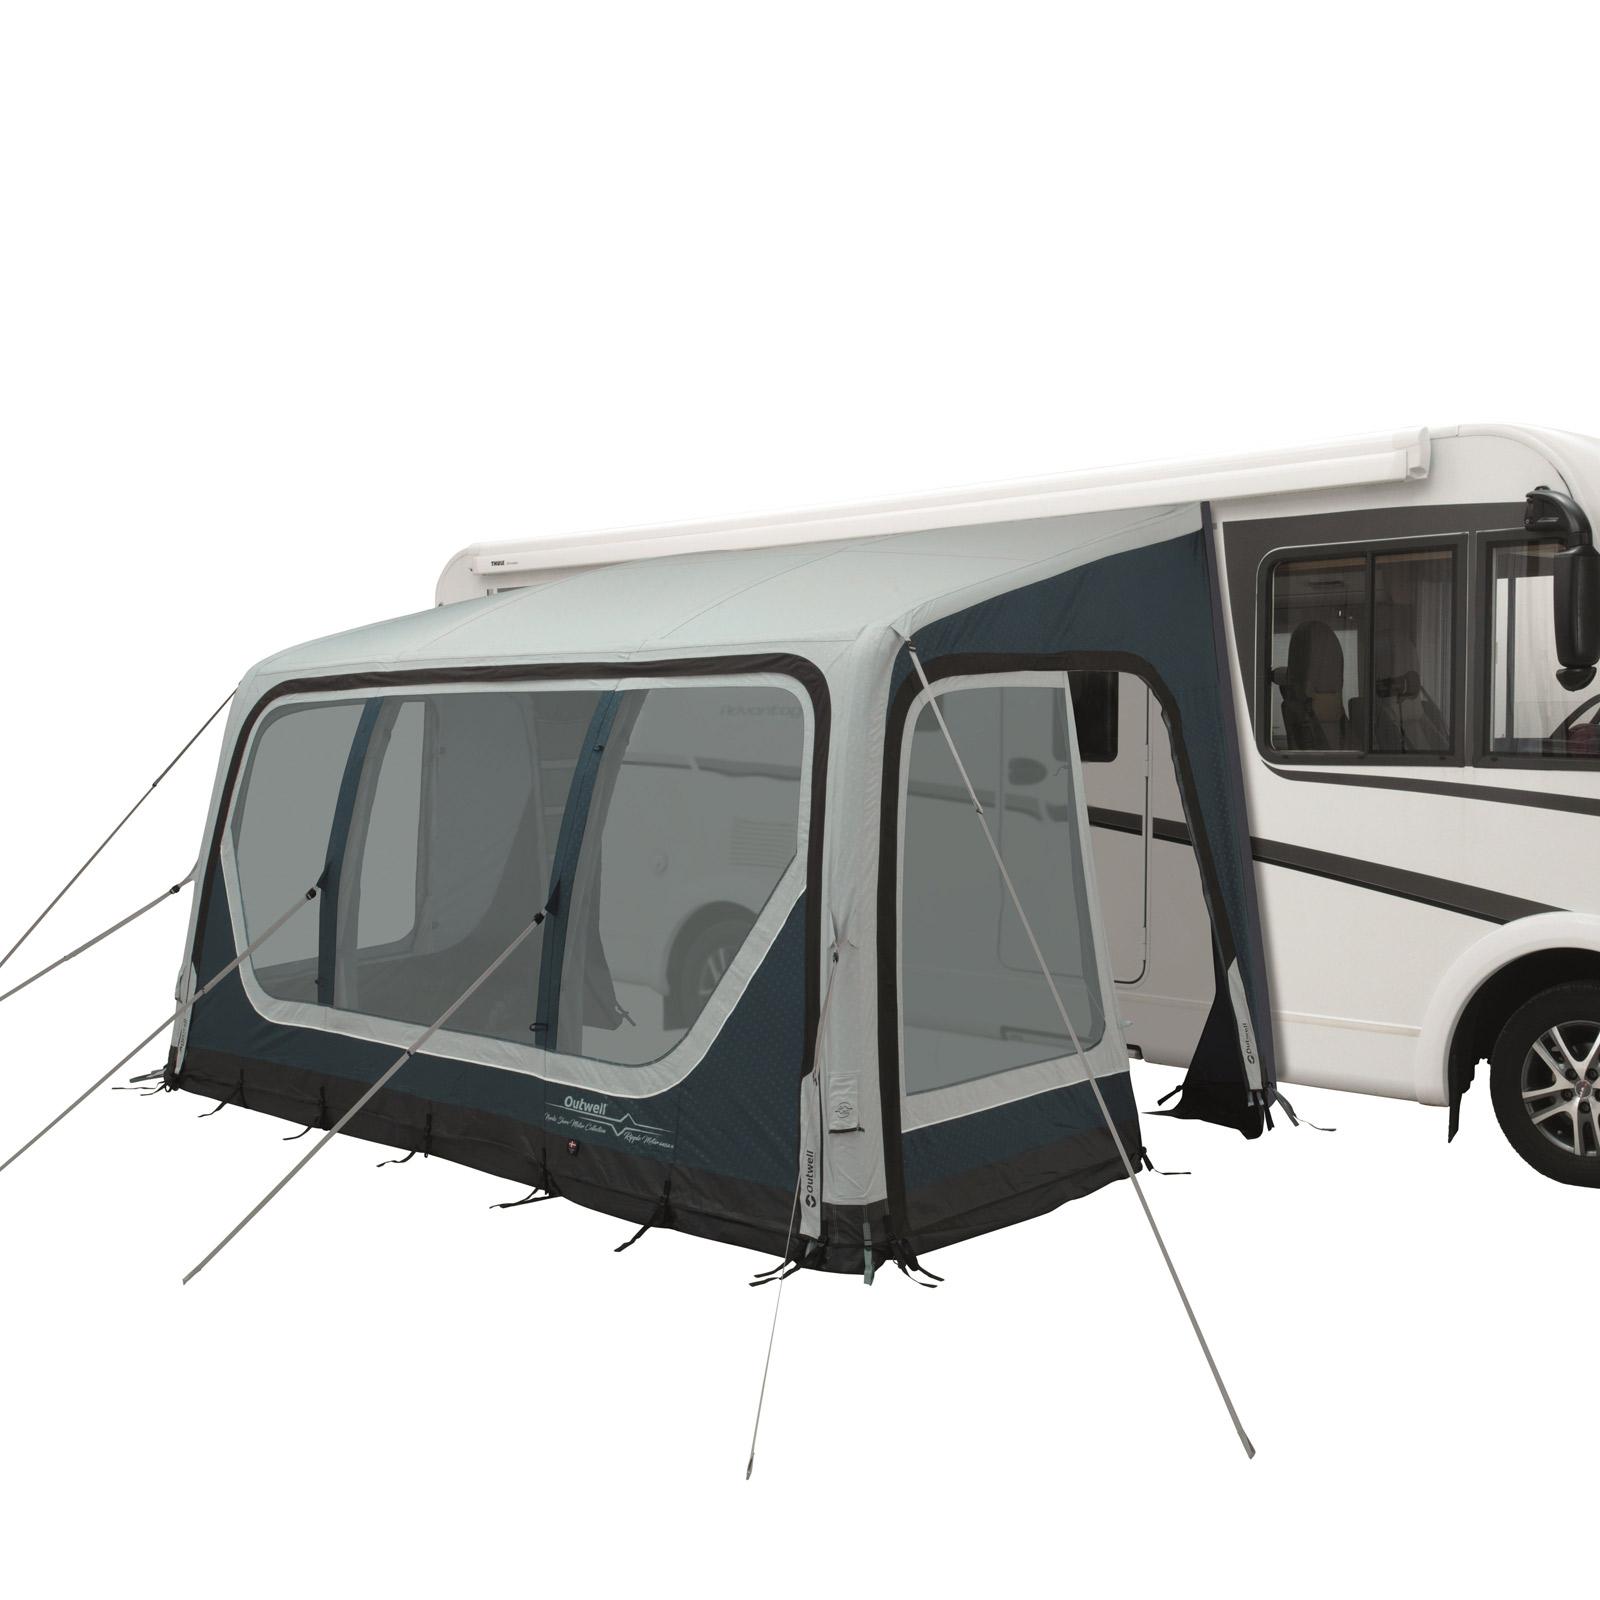 outwell ripple motor 440sa m busvorzelt f r wohnwagen. Black Bedroom Furniture Sets. Home Design Ideas